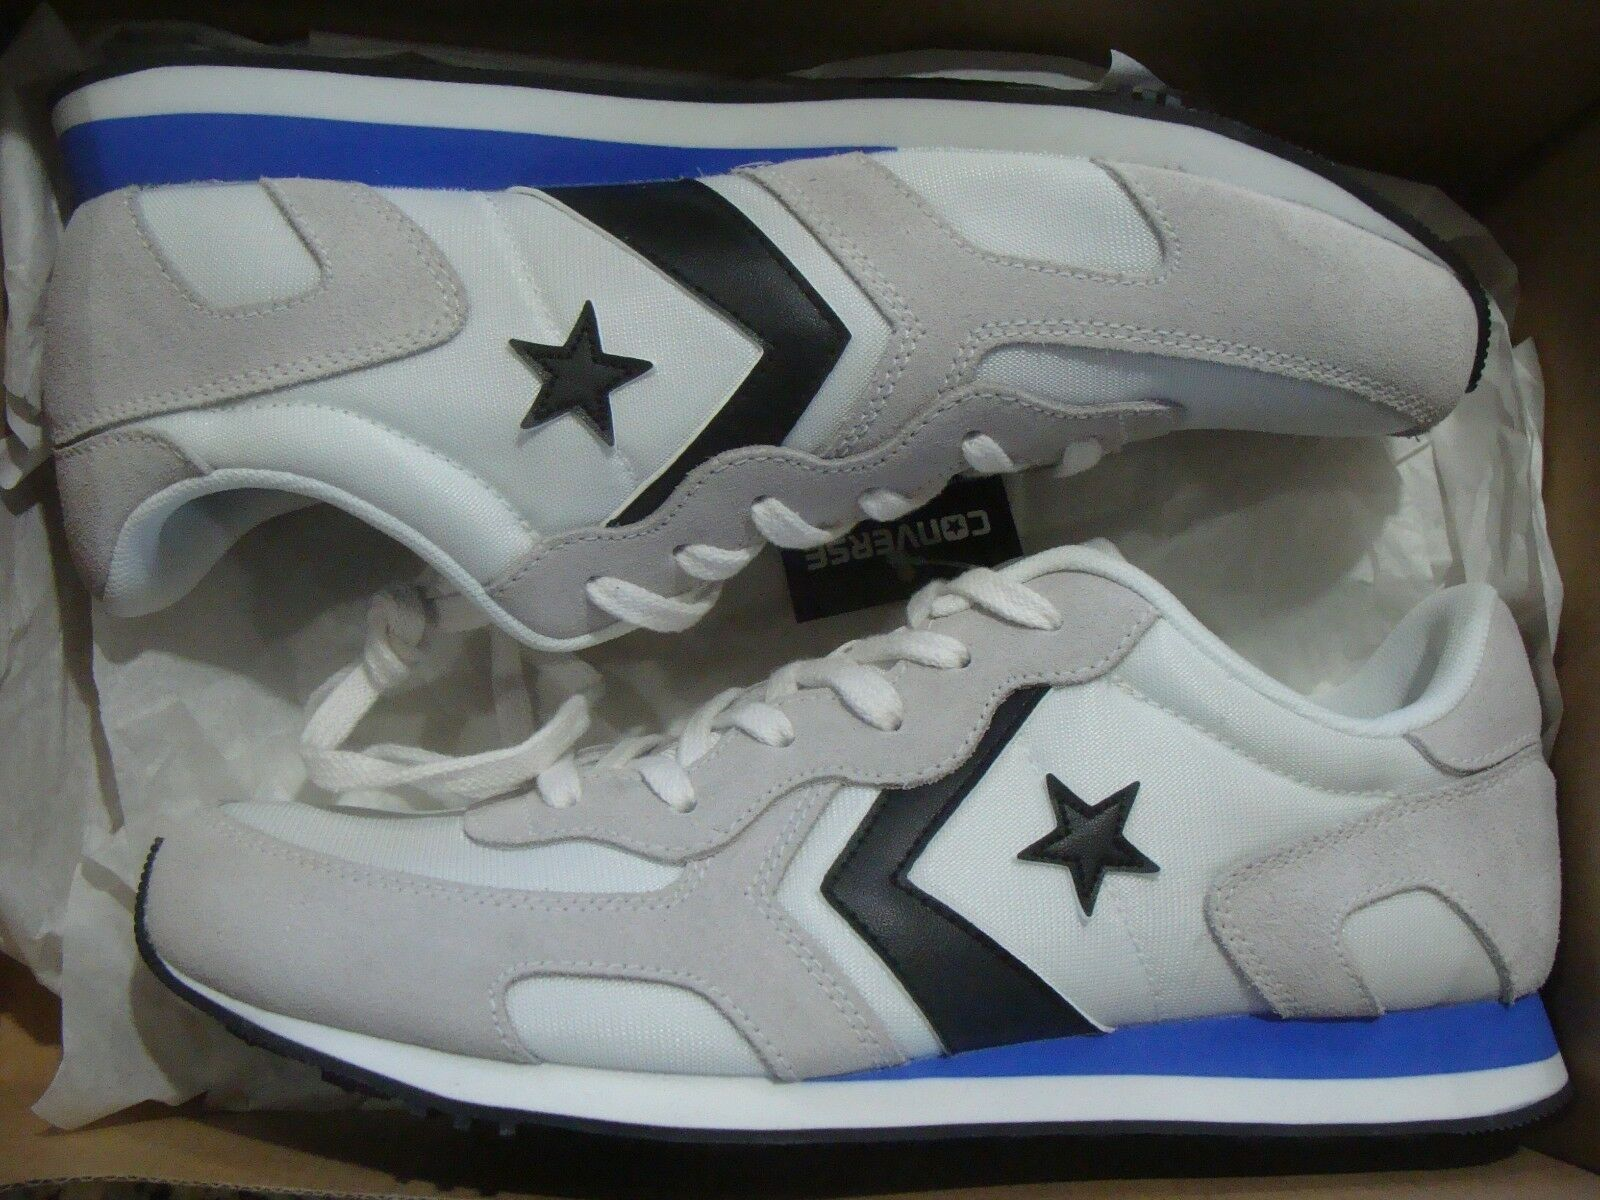 Men's Converse Thunderbolt Ox White/Hyper Royal/Black 159765C Size 6.5~13